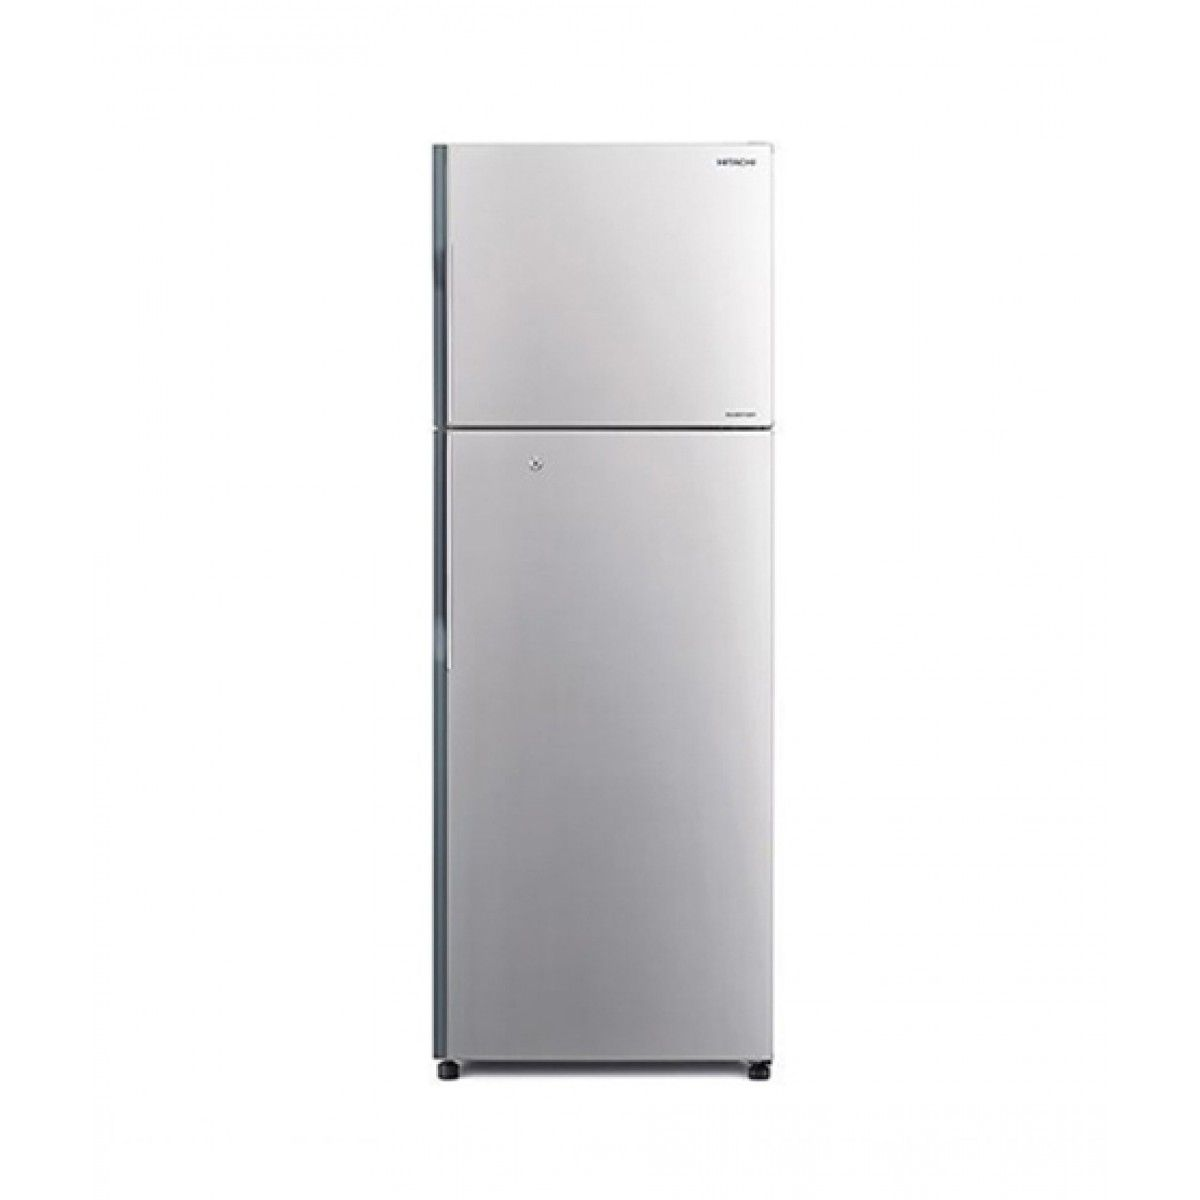 Hitachi (R-H350P4PBK) Freezer-on-Top 11 cu ft Refrigerator Silver